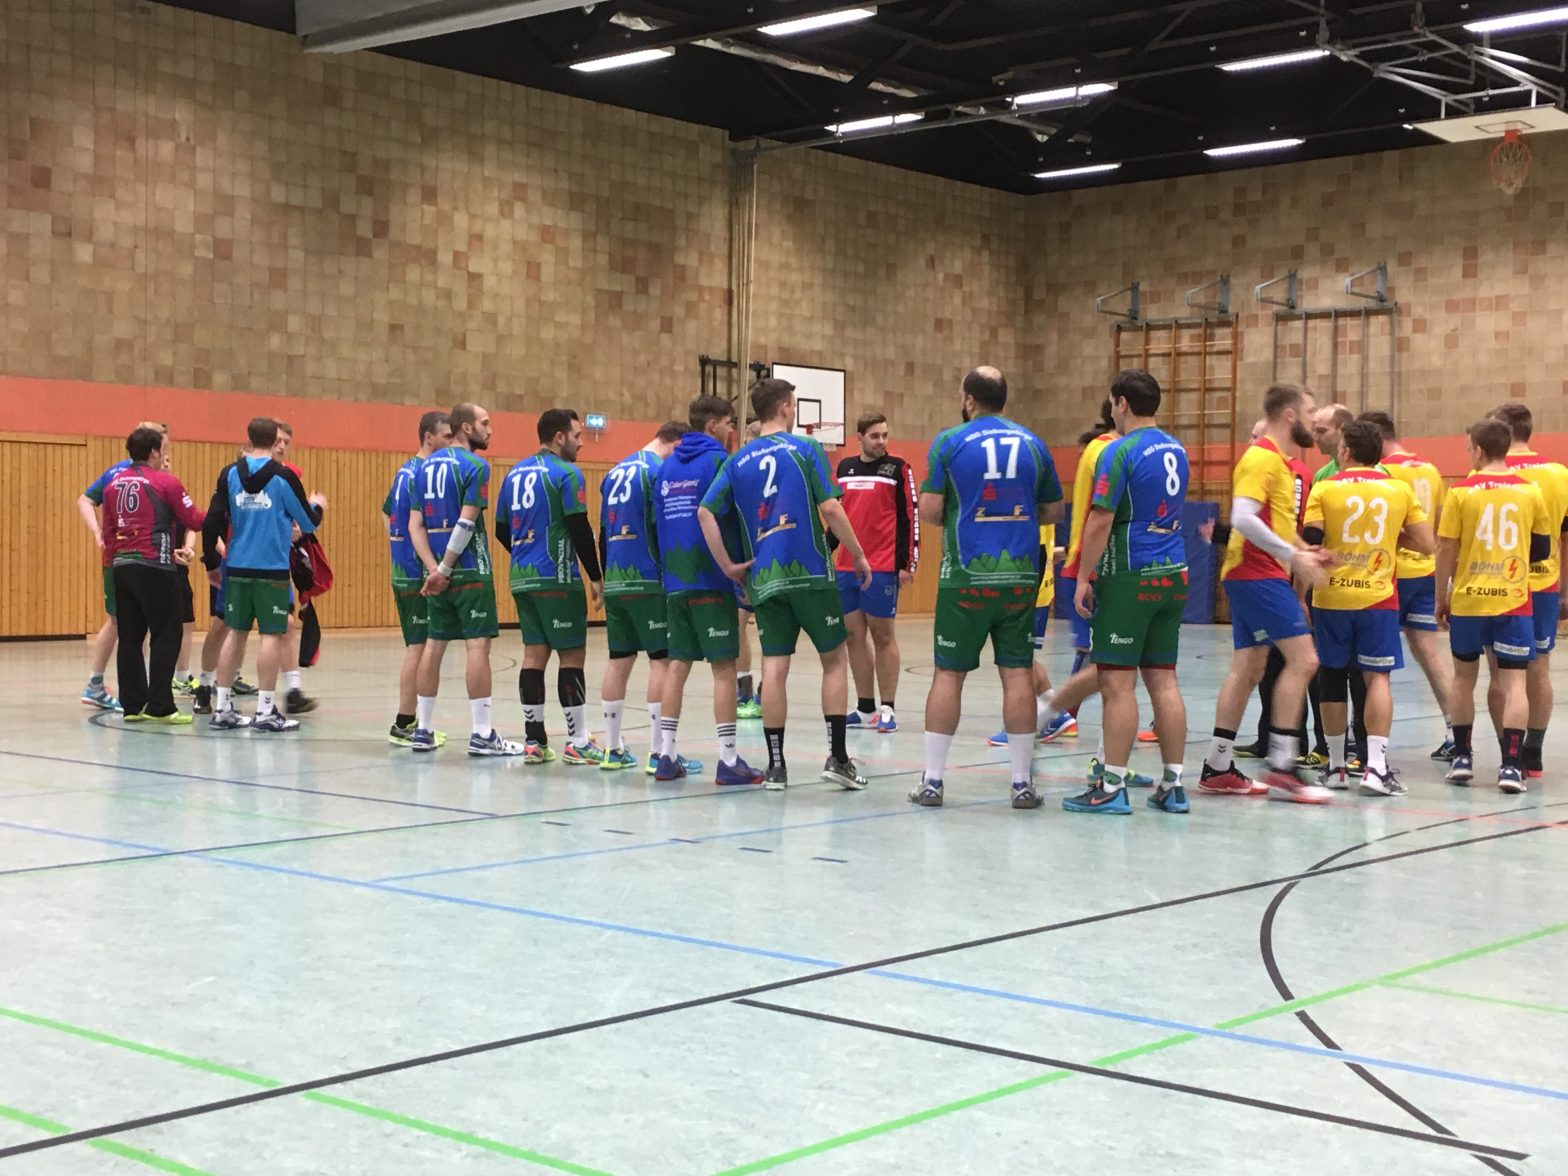 HSV Troisdorf HSG3 2017 11 25